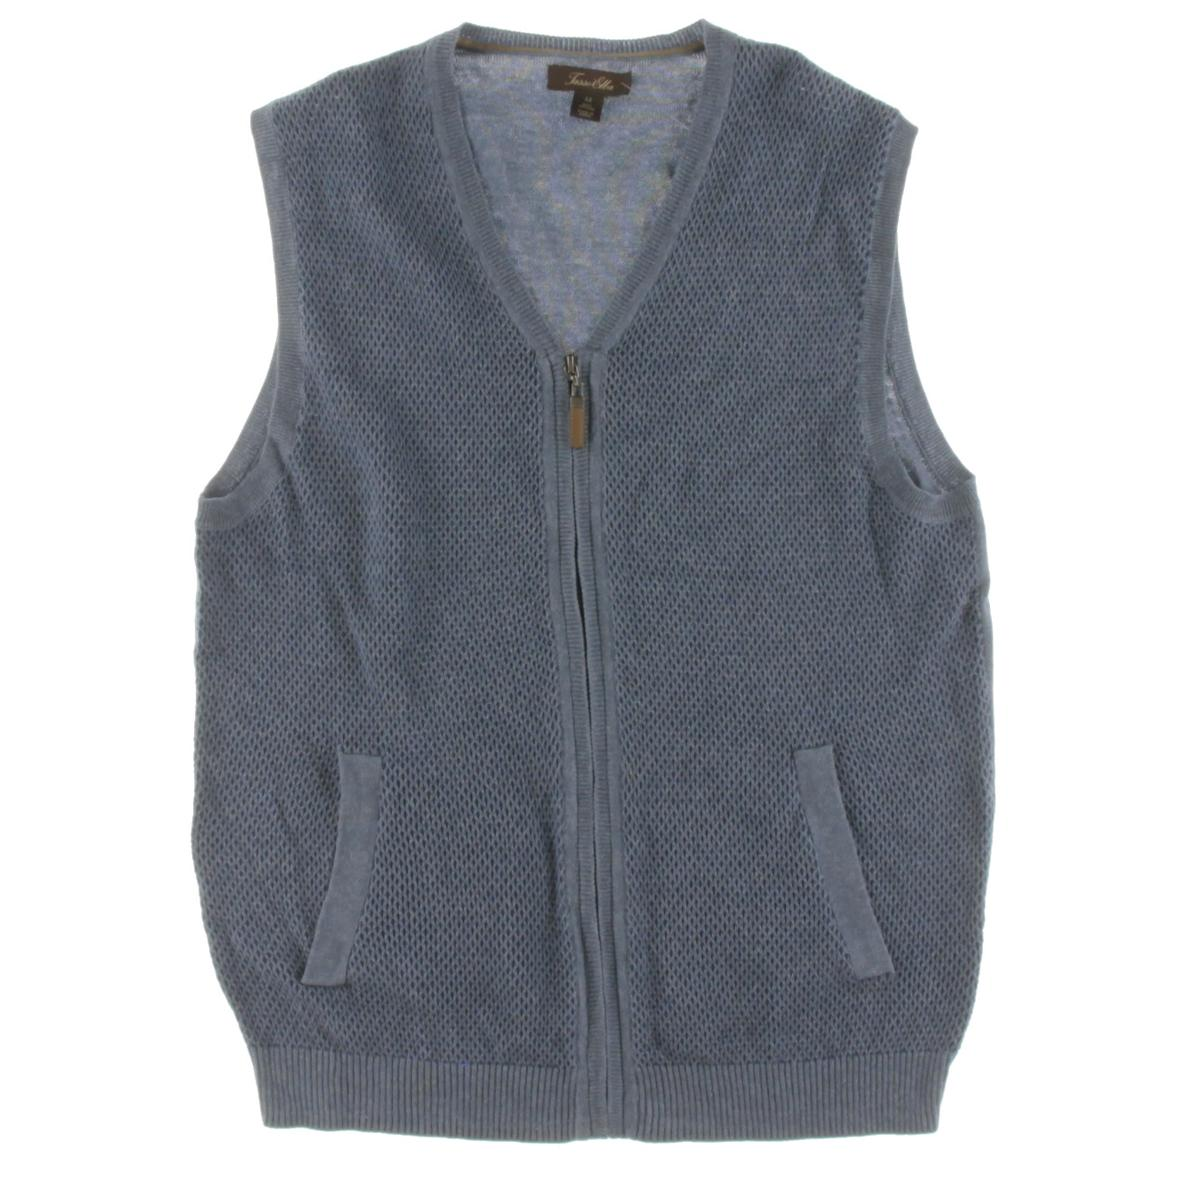 Tasso Elba 8676 Mens Knit V-Neck Front-Zip Sweater Vest BHFO | eBay